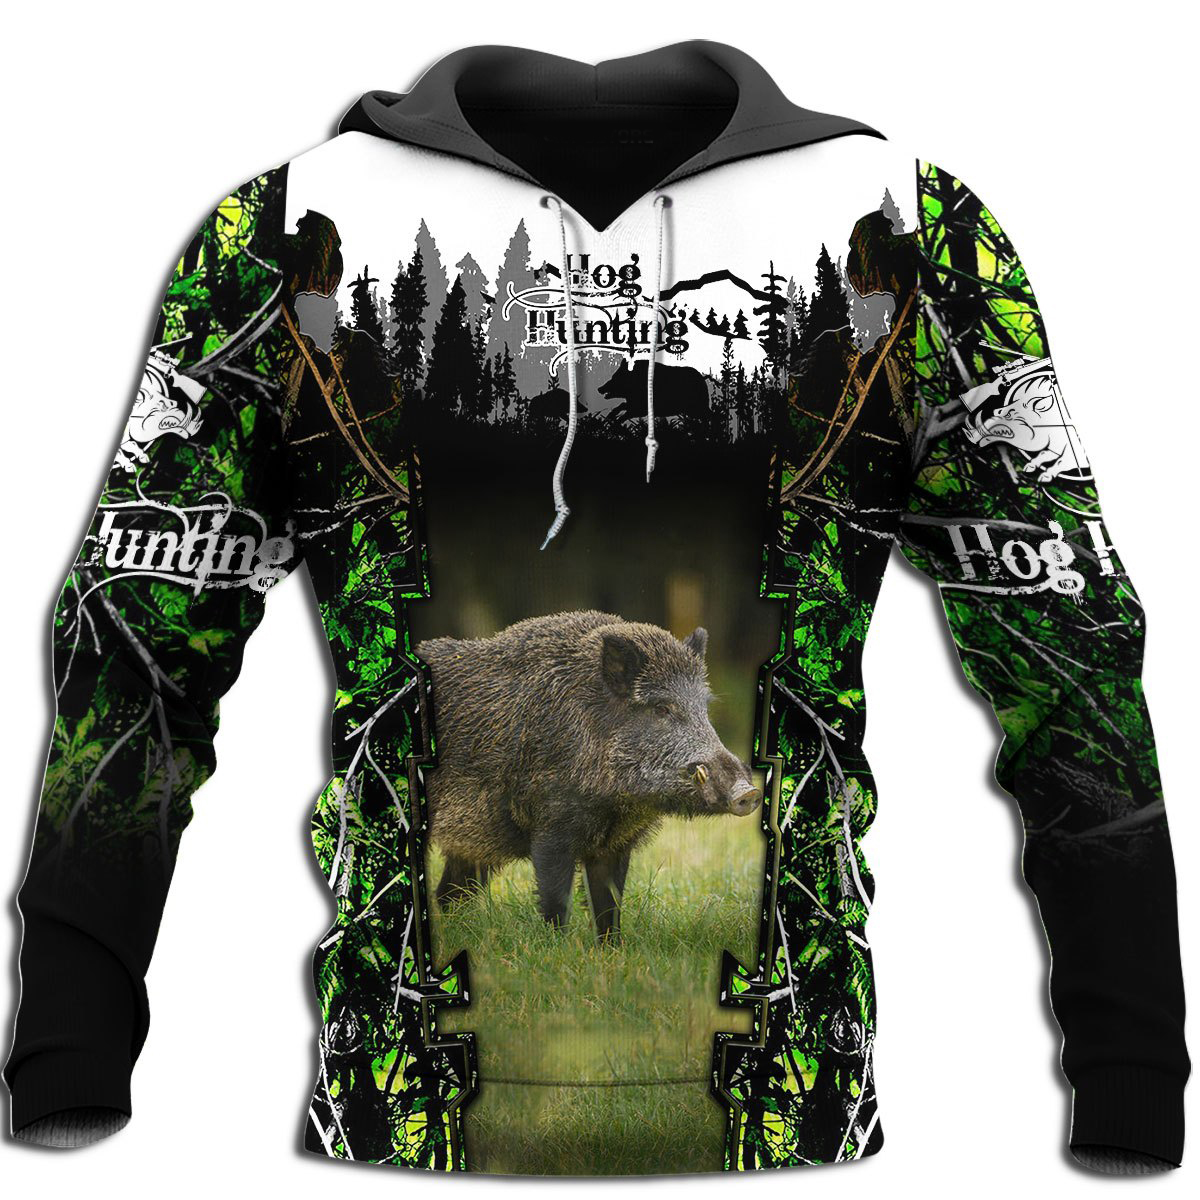 Drop shipping Hog Hunting Animal 3D All Over Printed Mens Hoodie Harajuku Fashion Sweatshirt Unisex Casual Pullover KJ033